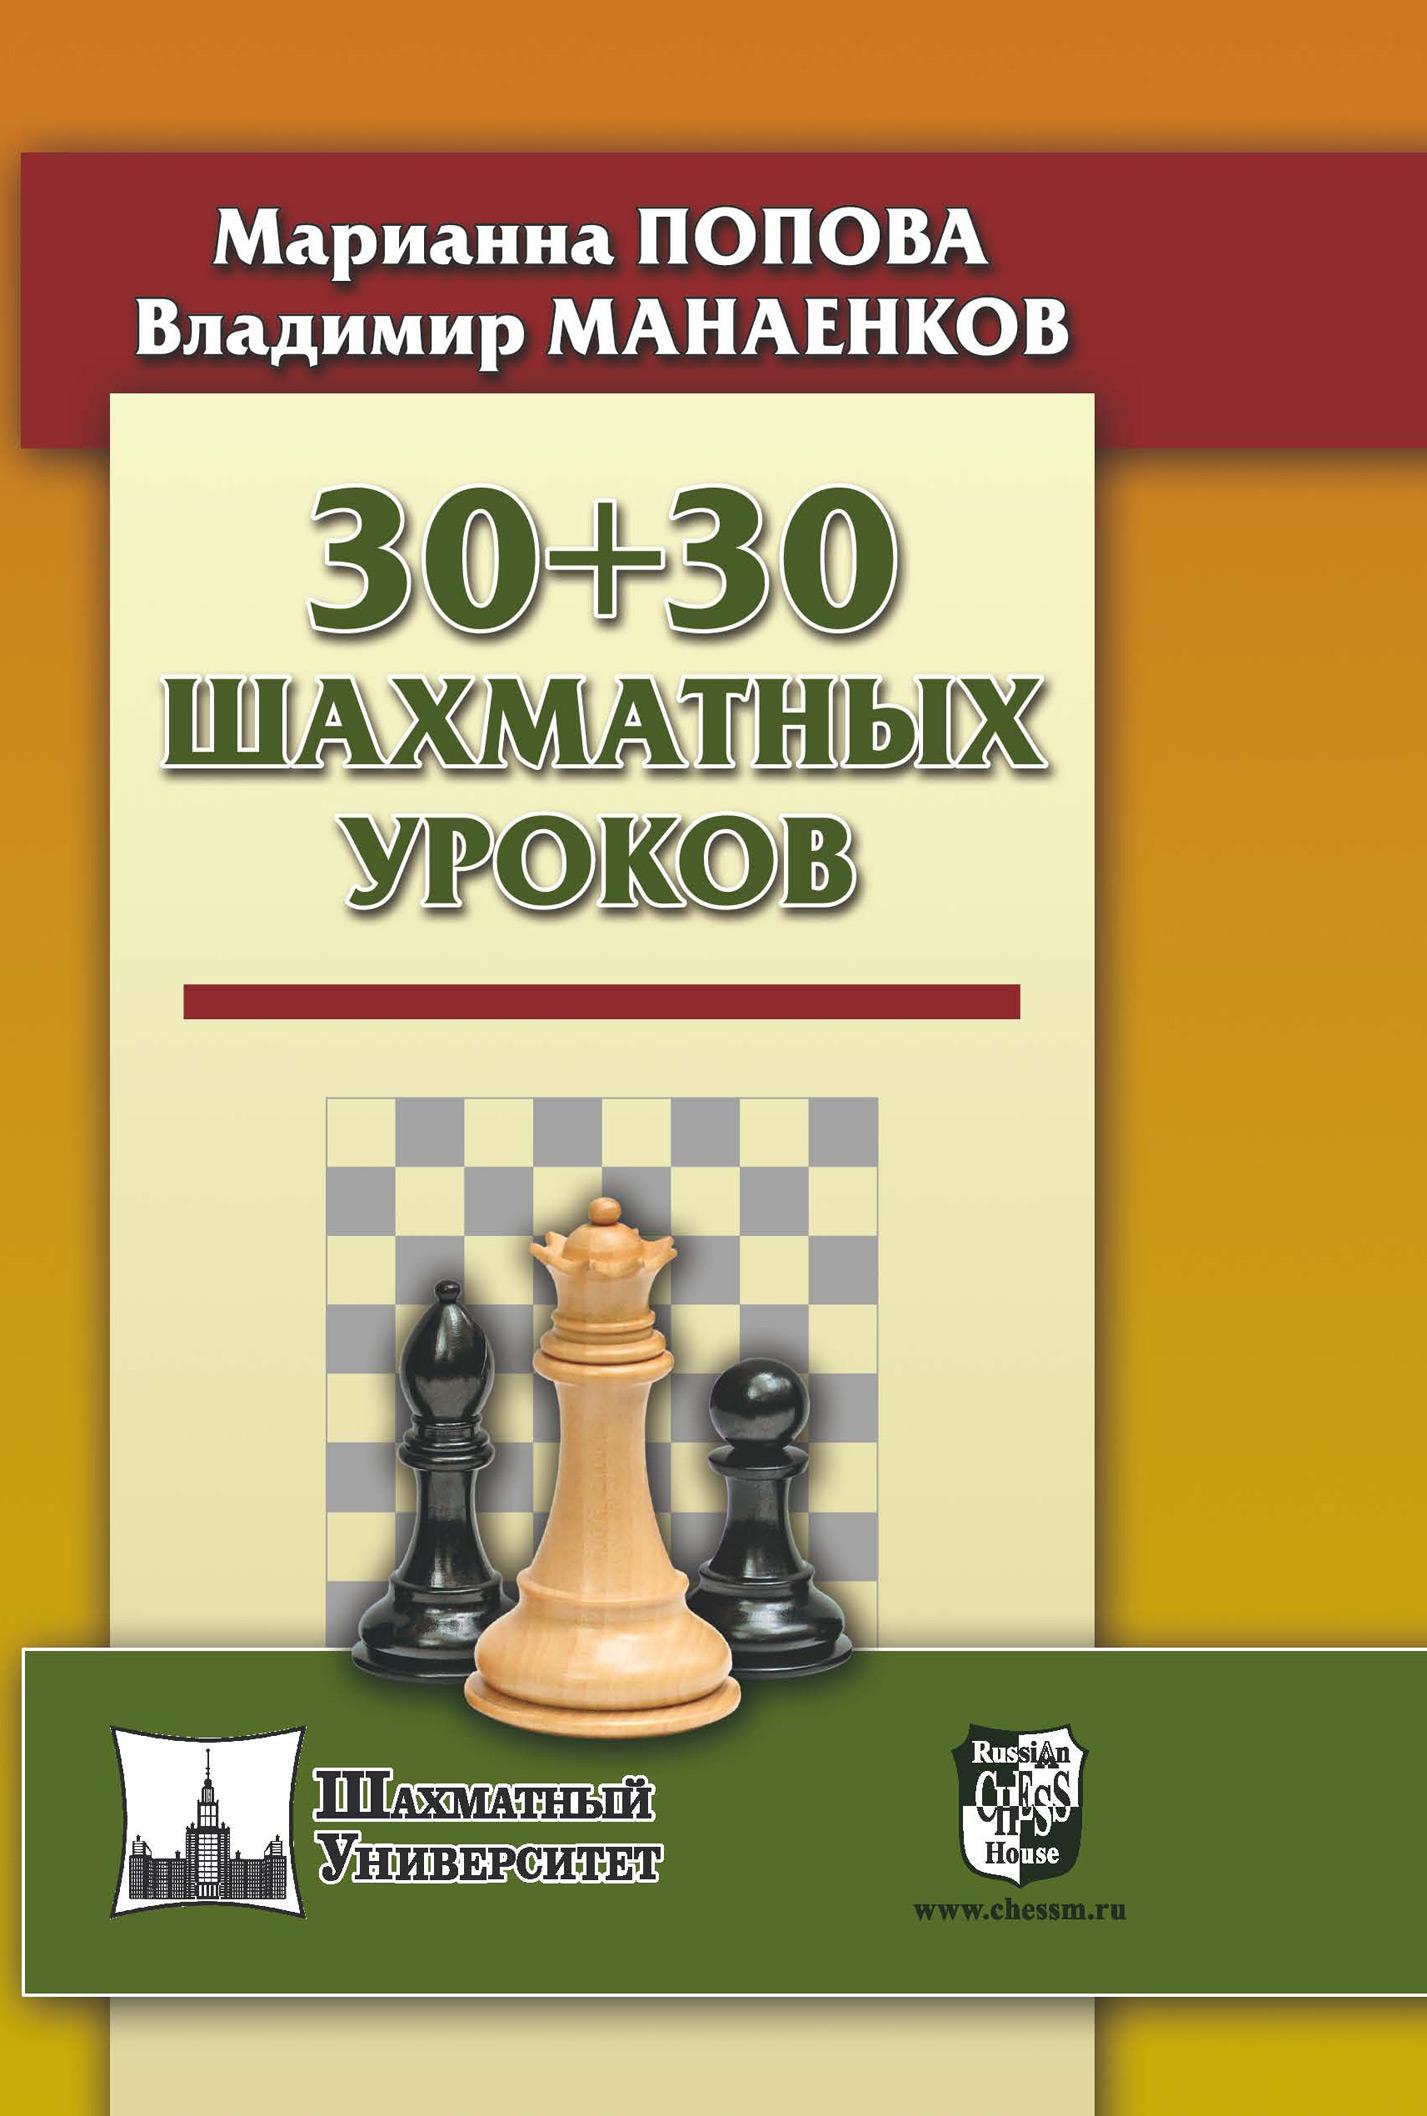 30 + 30 Шахматных уроков